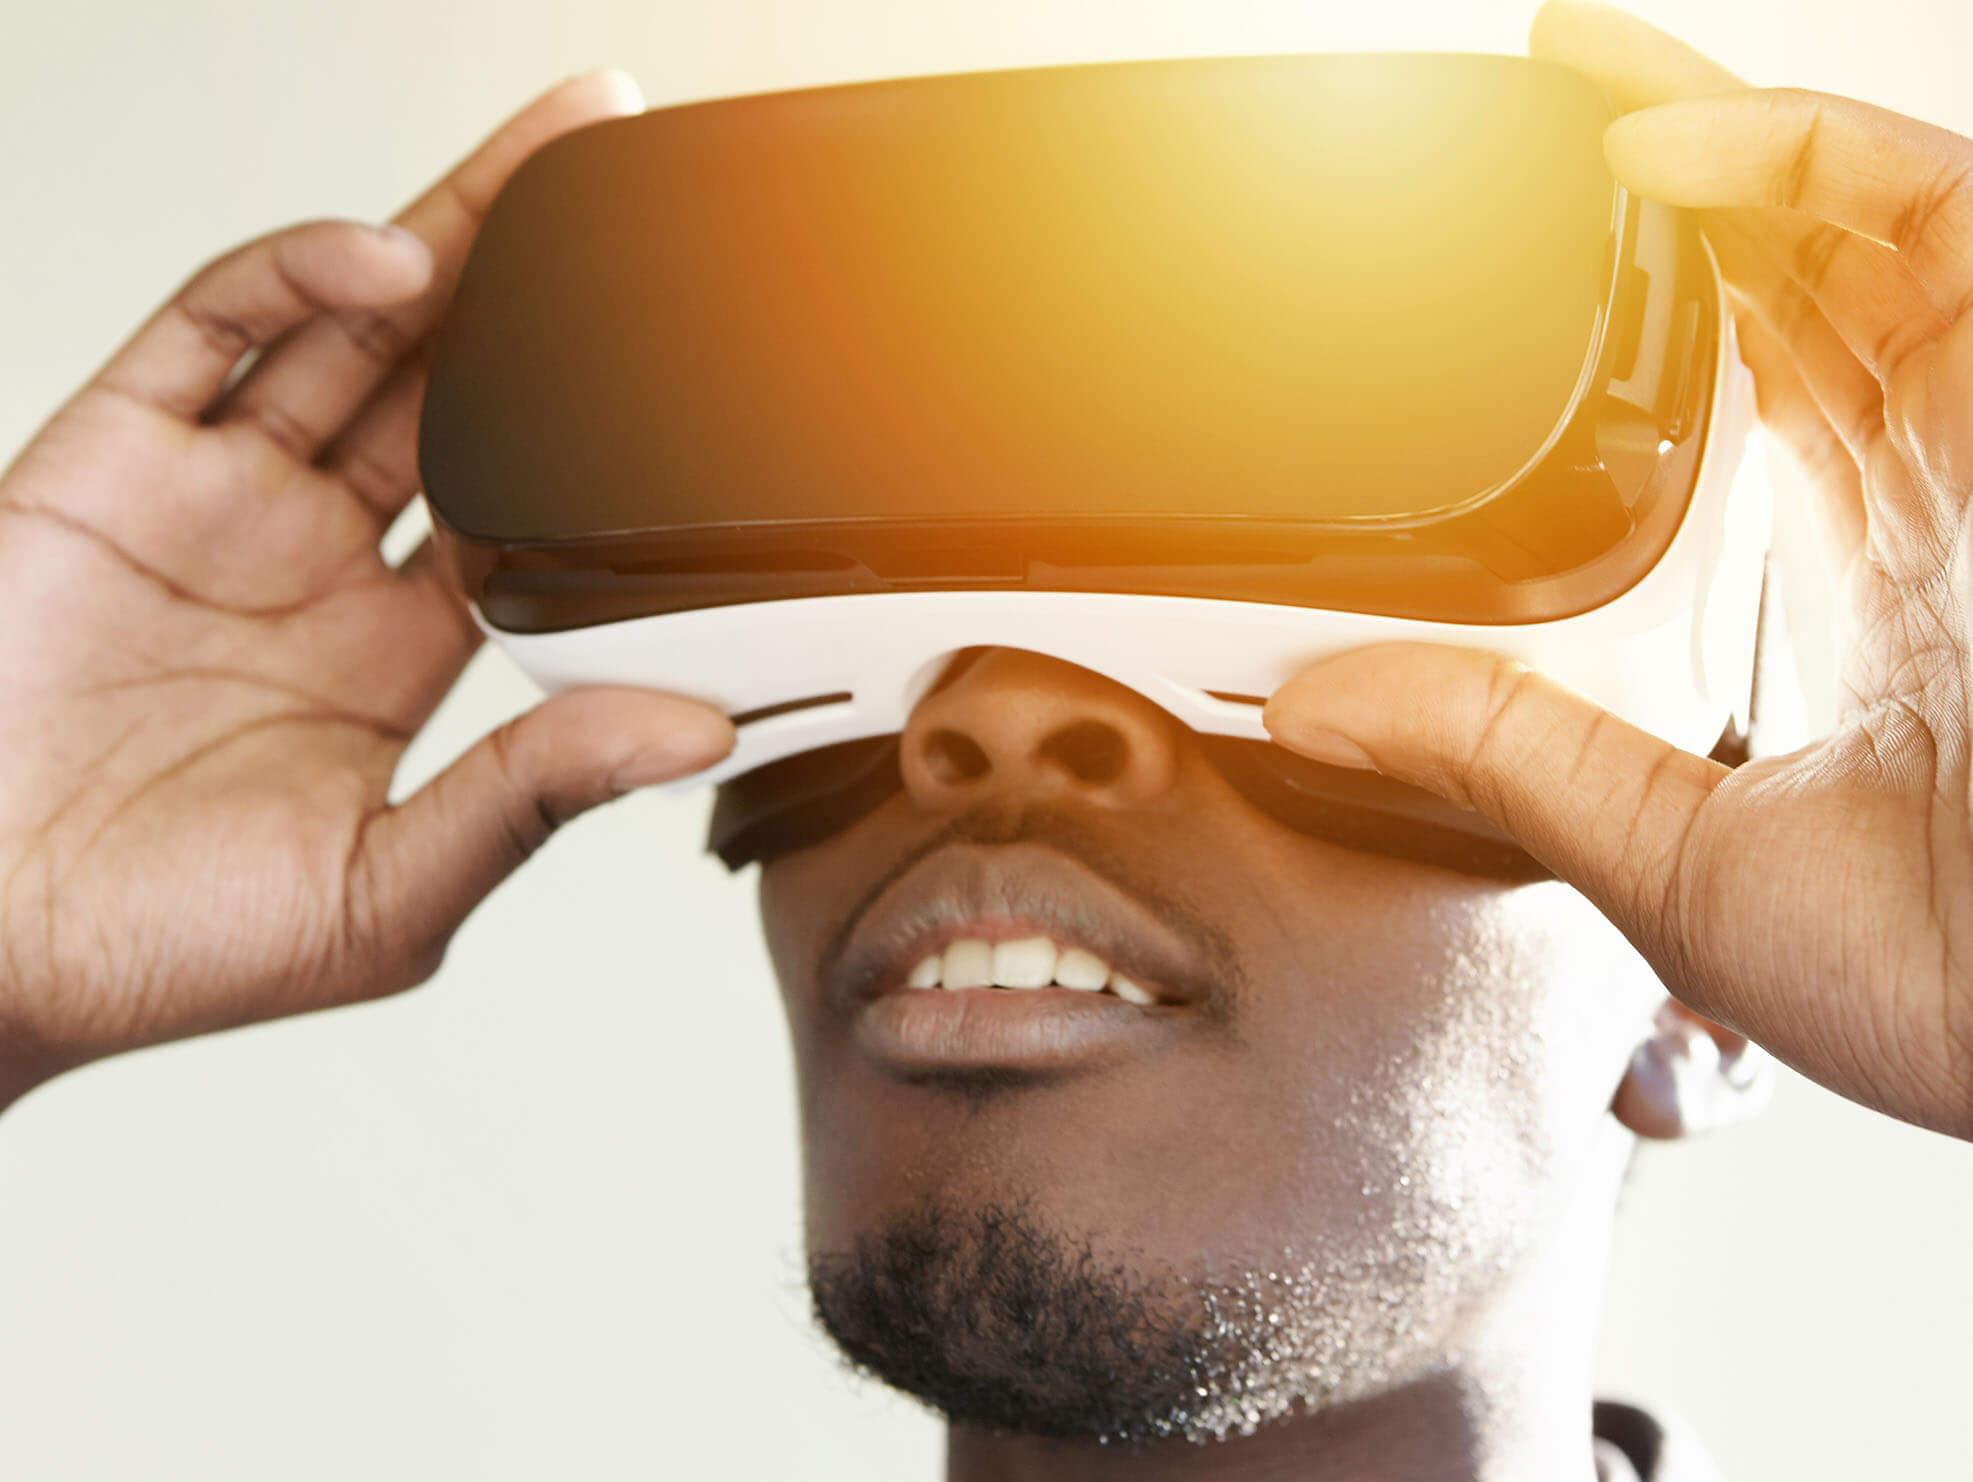 immersive-technologies